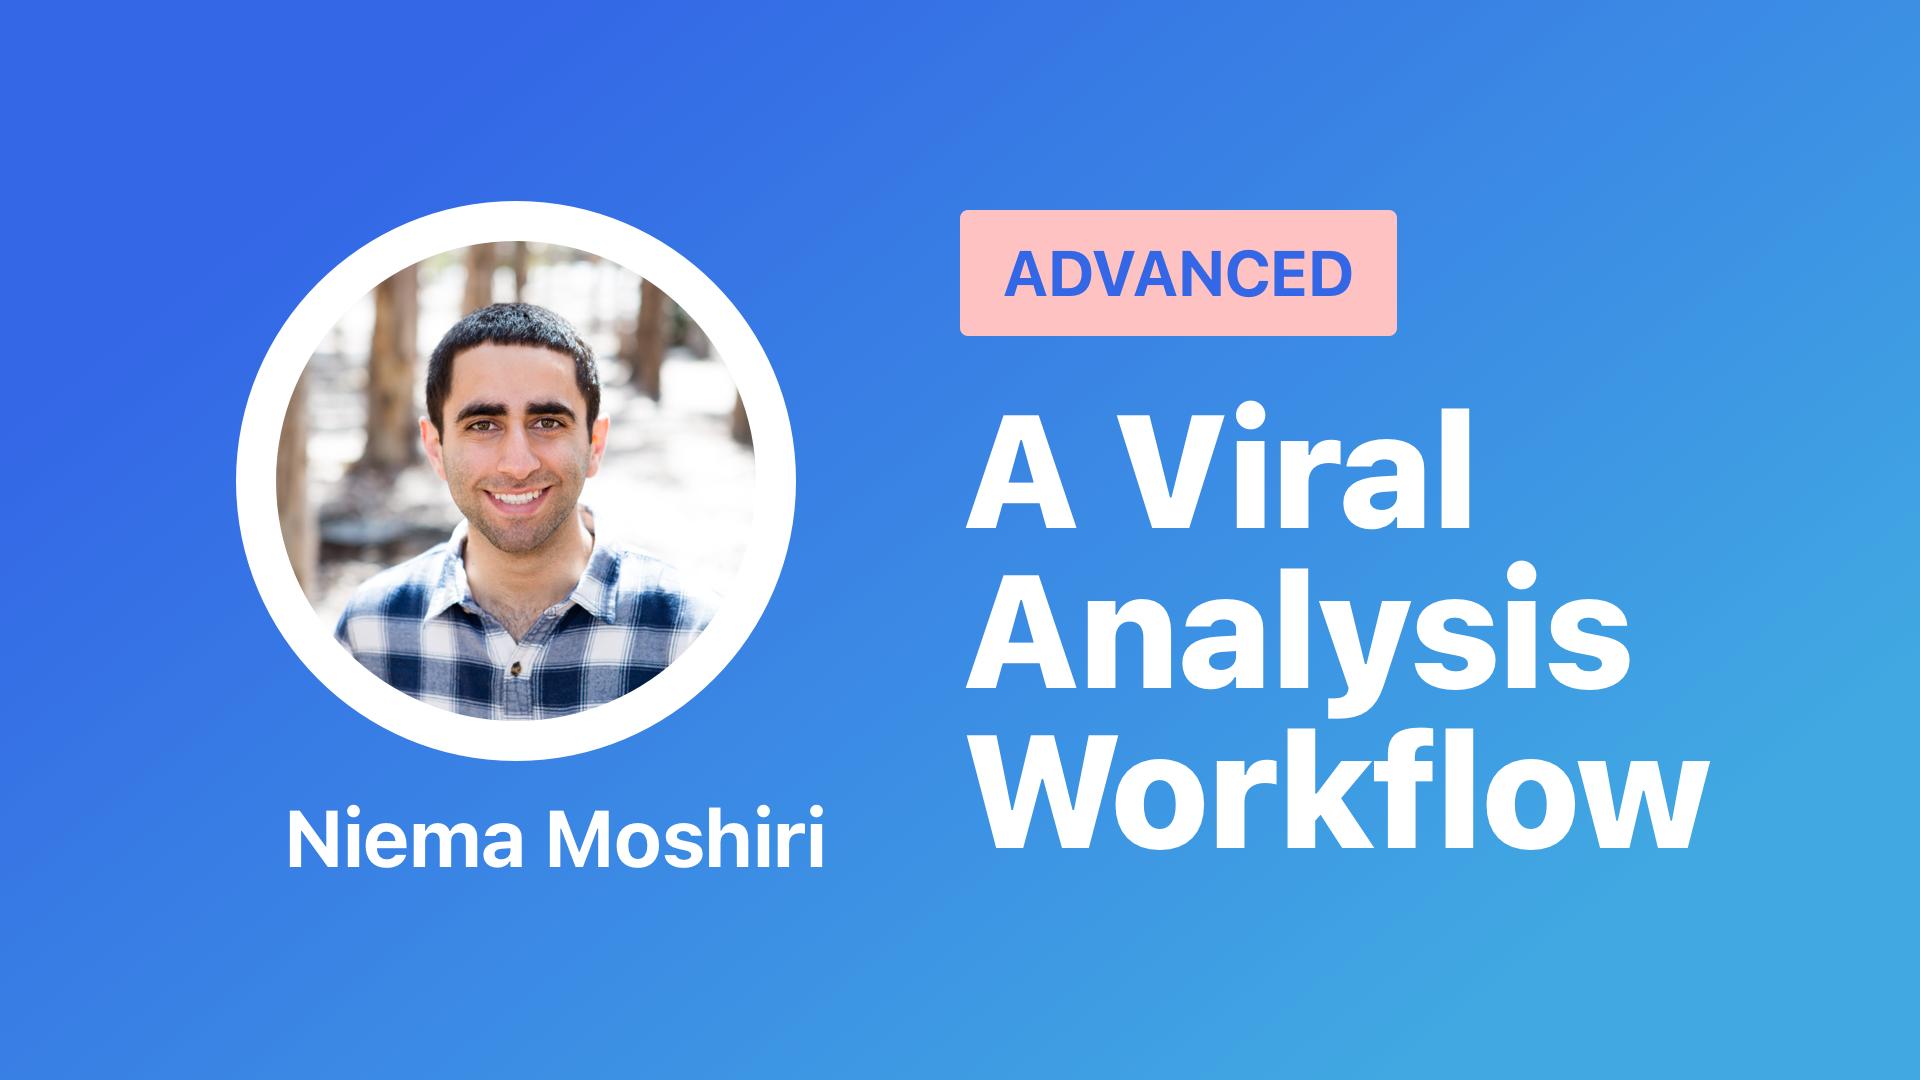 a viral analysis workflow